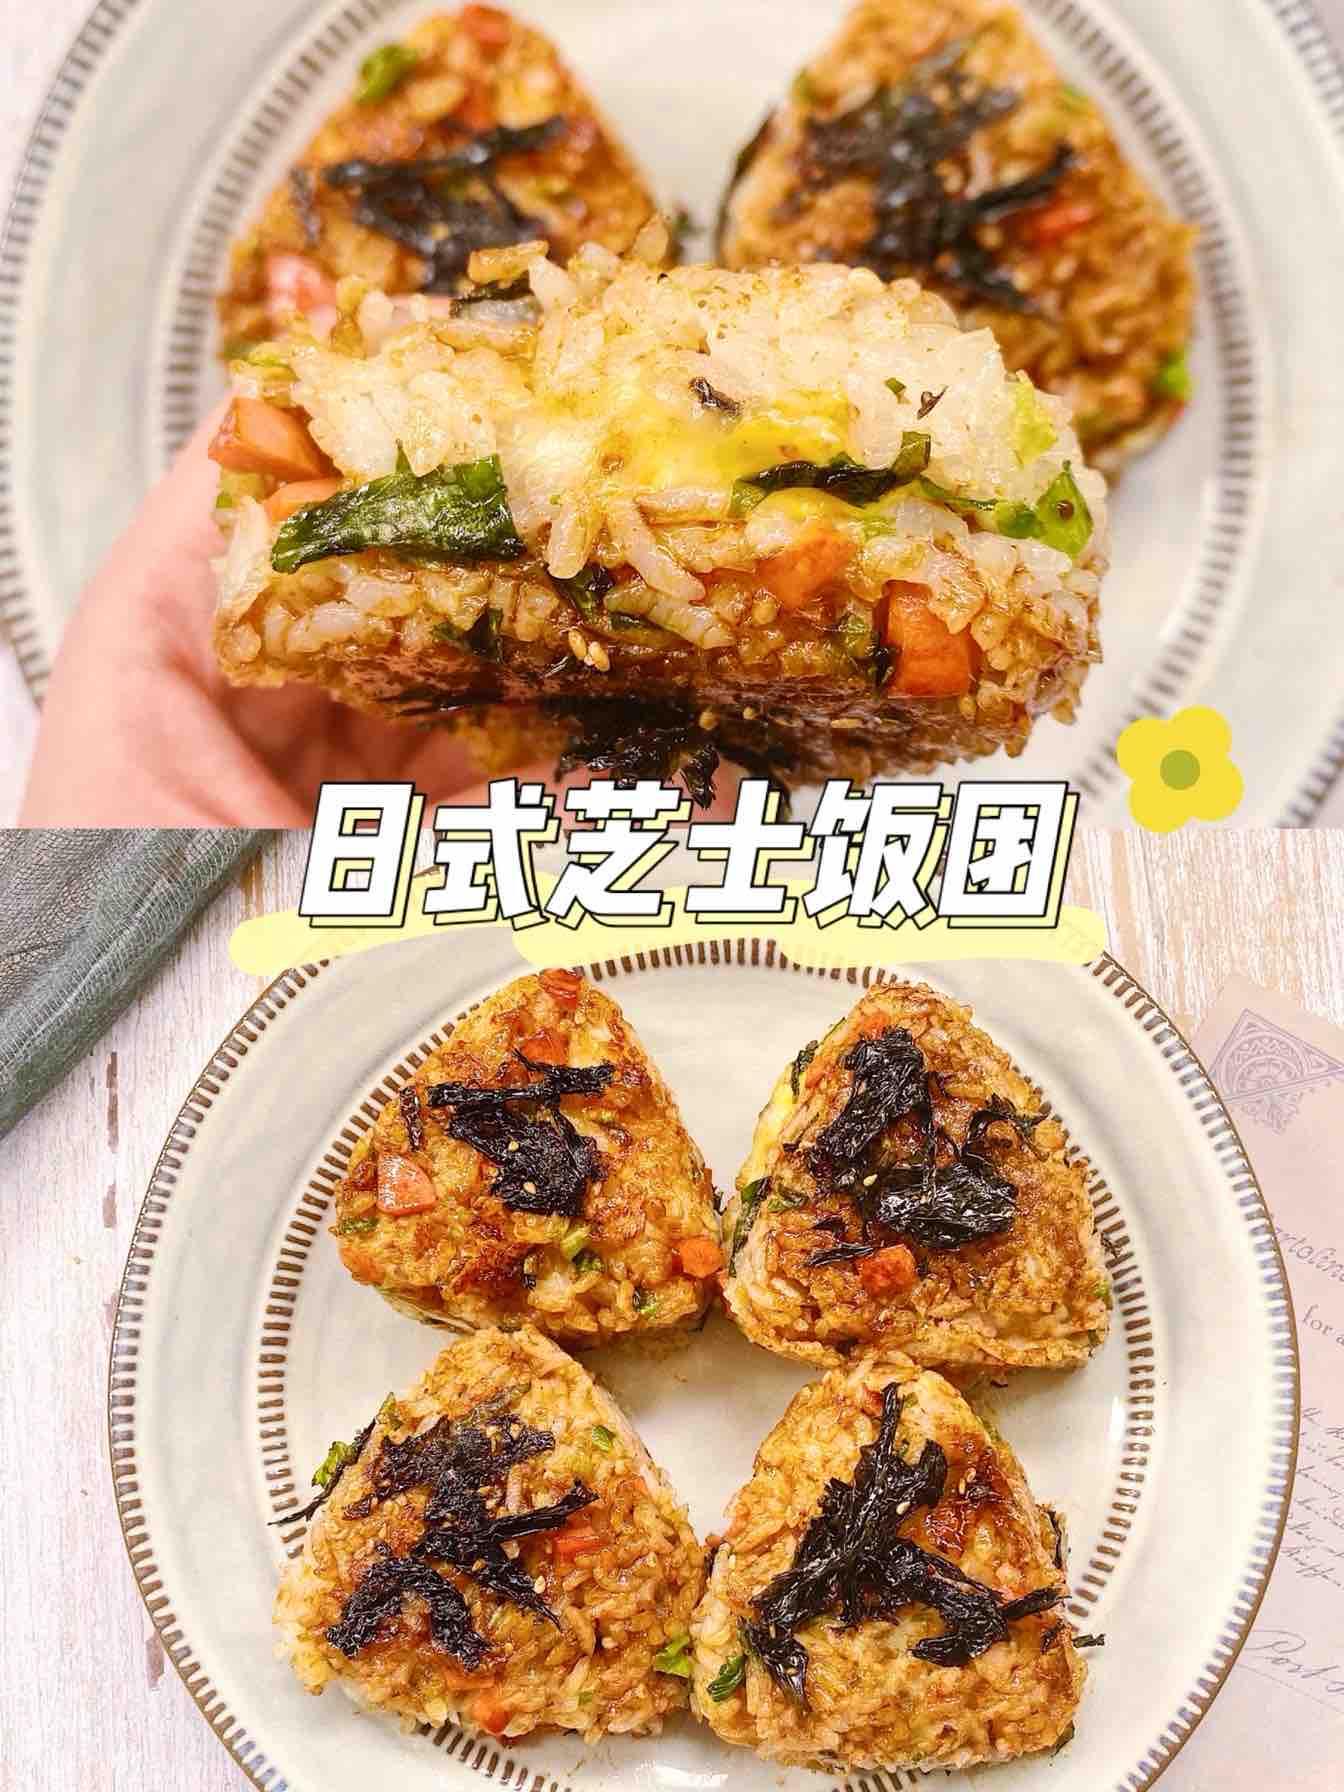 ㊙️米饭的神仙吃法|日式芝士饭团